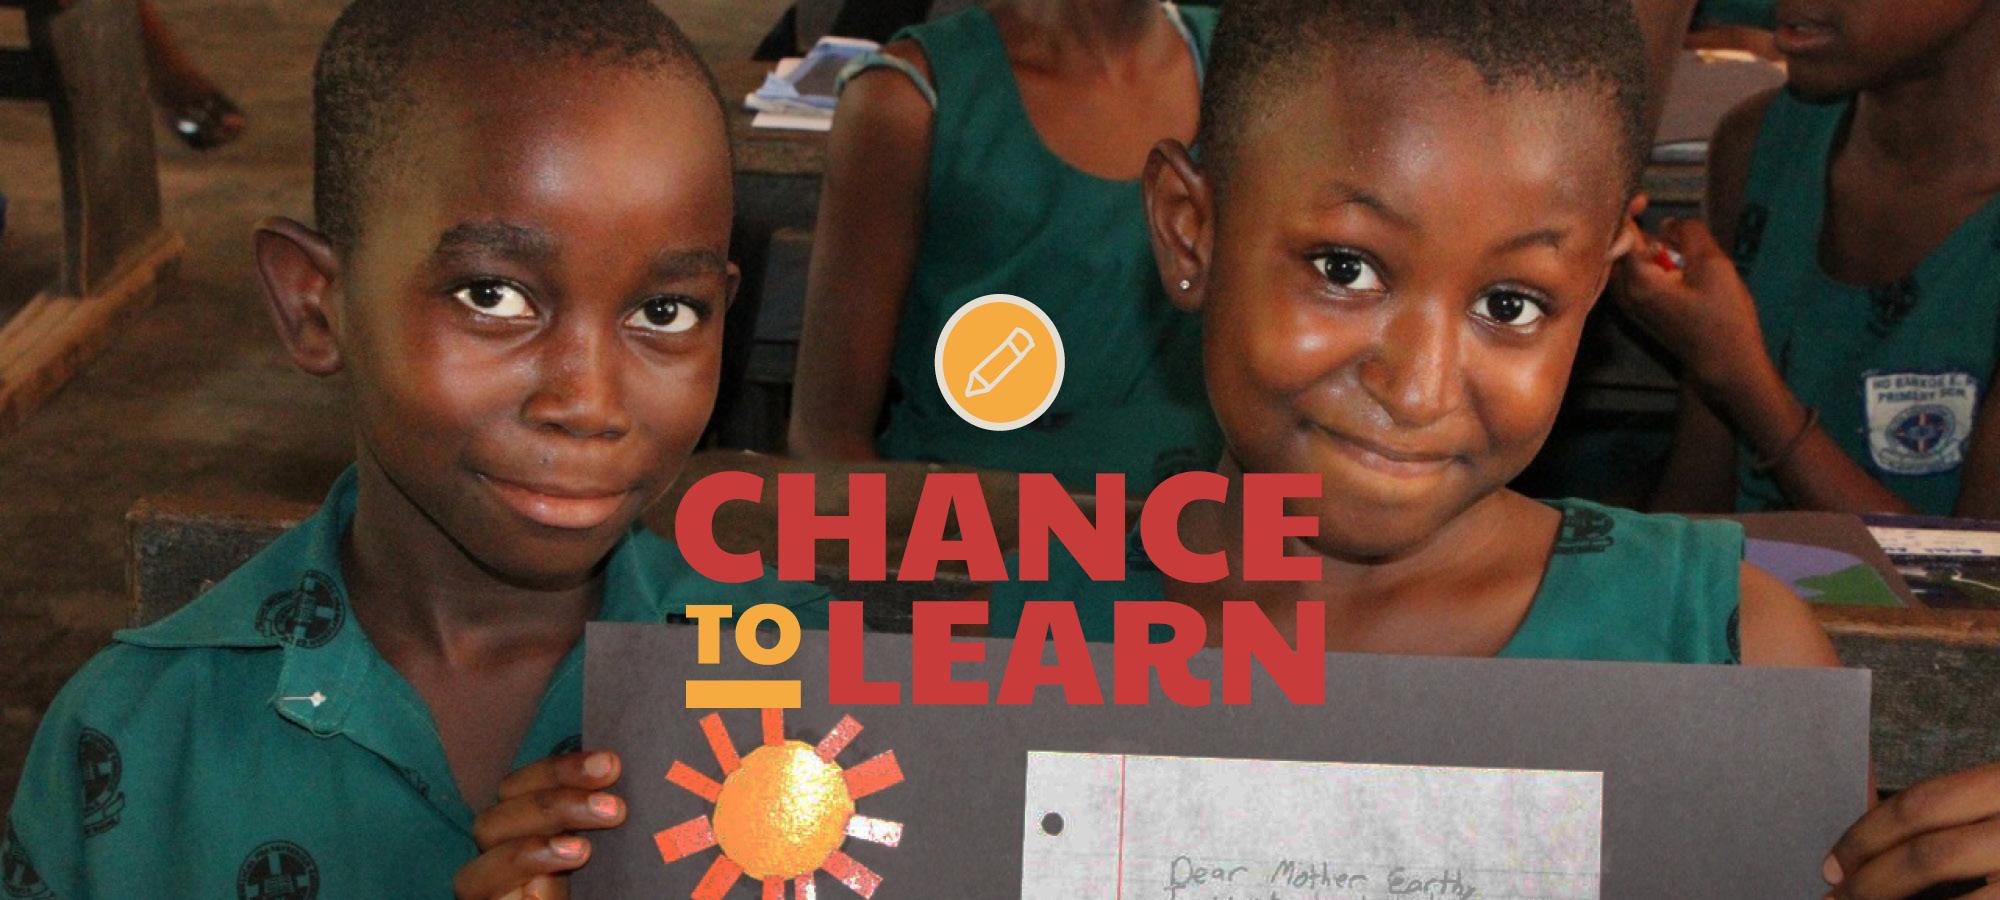 Chance to Learn.jpg